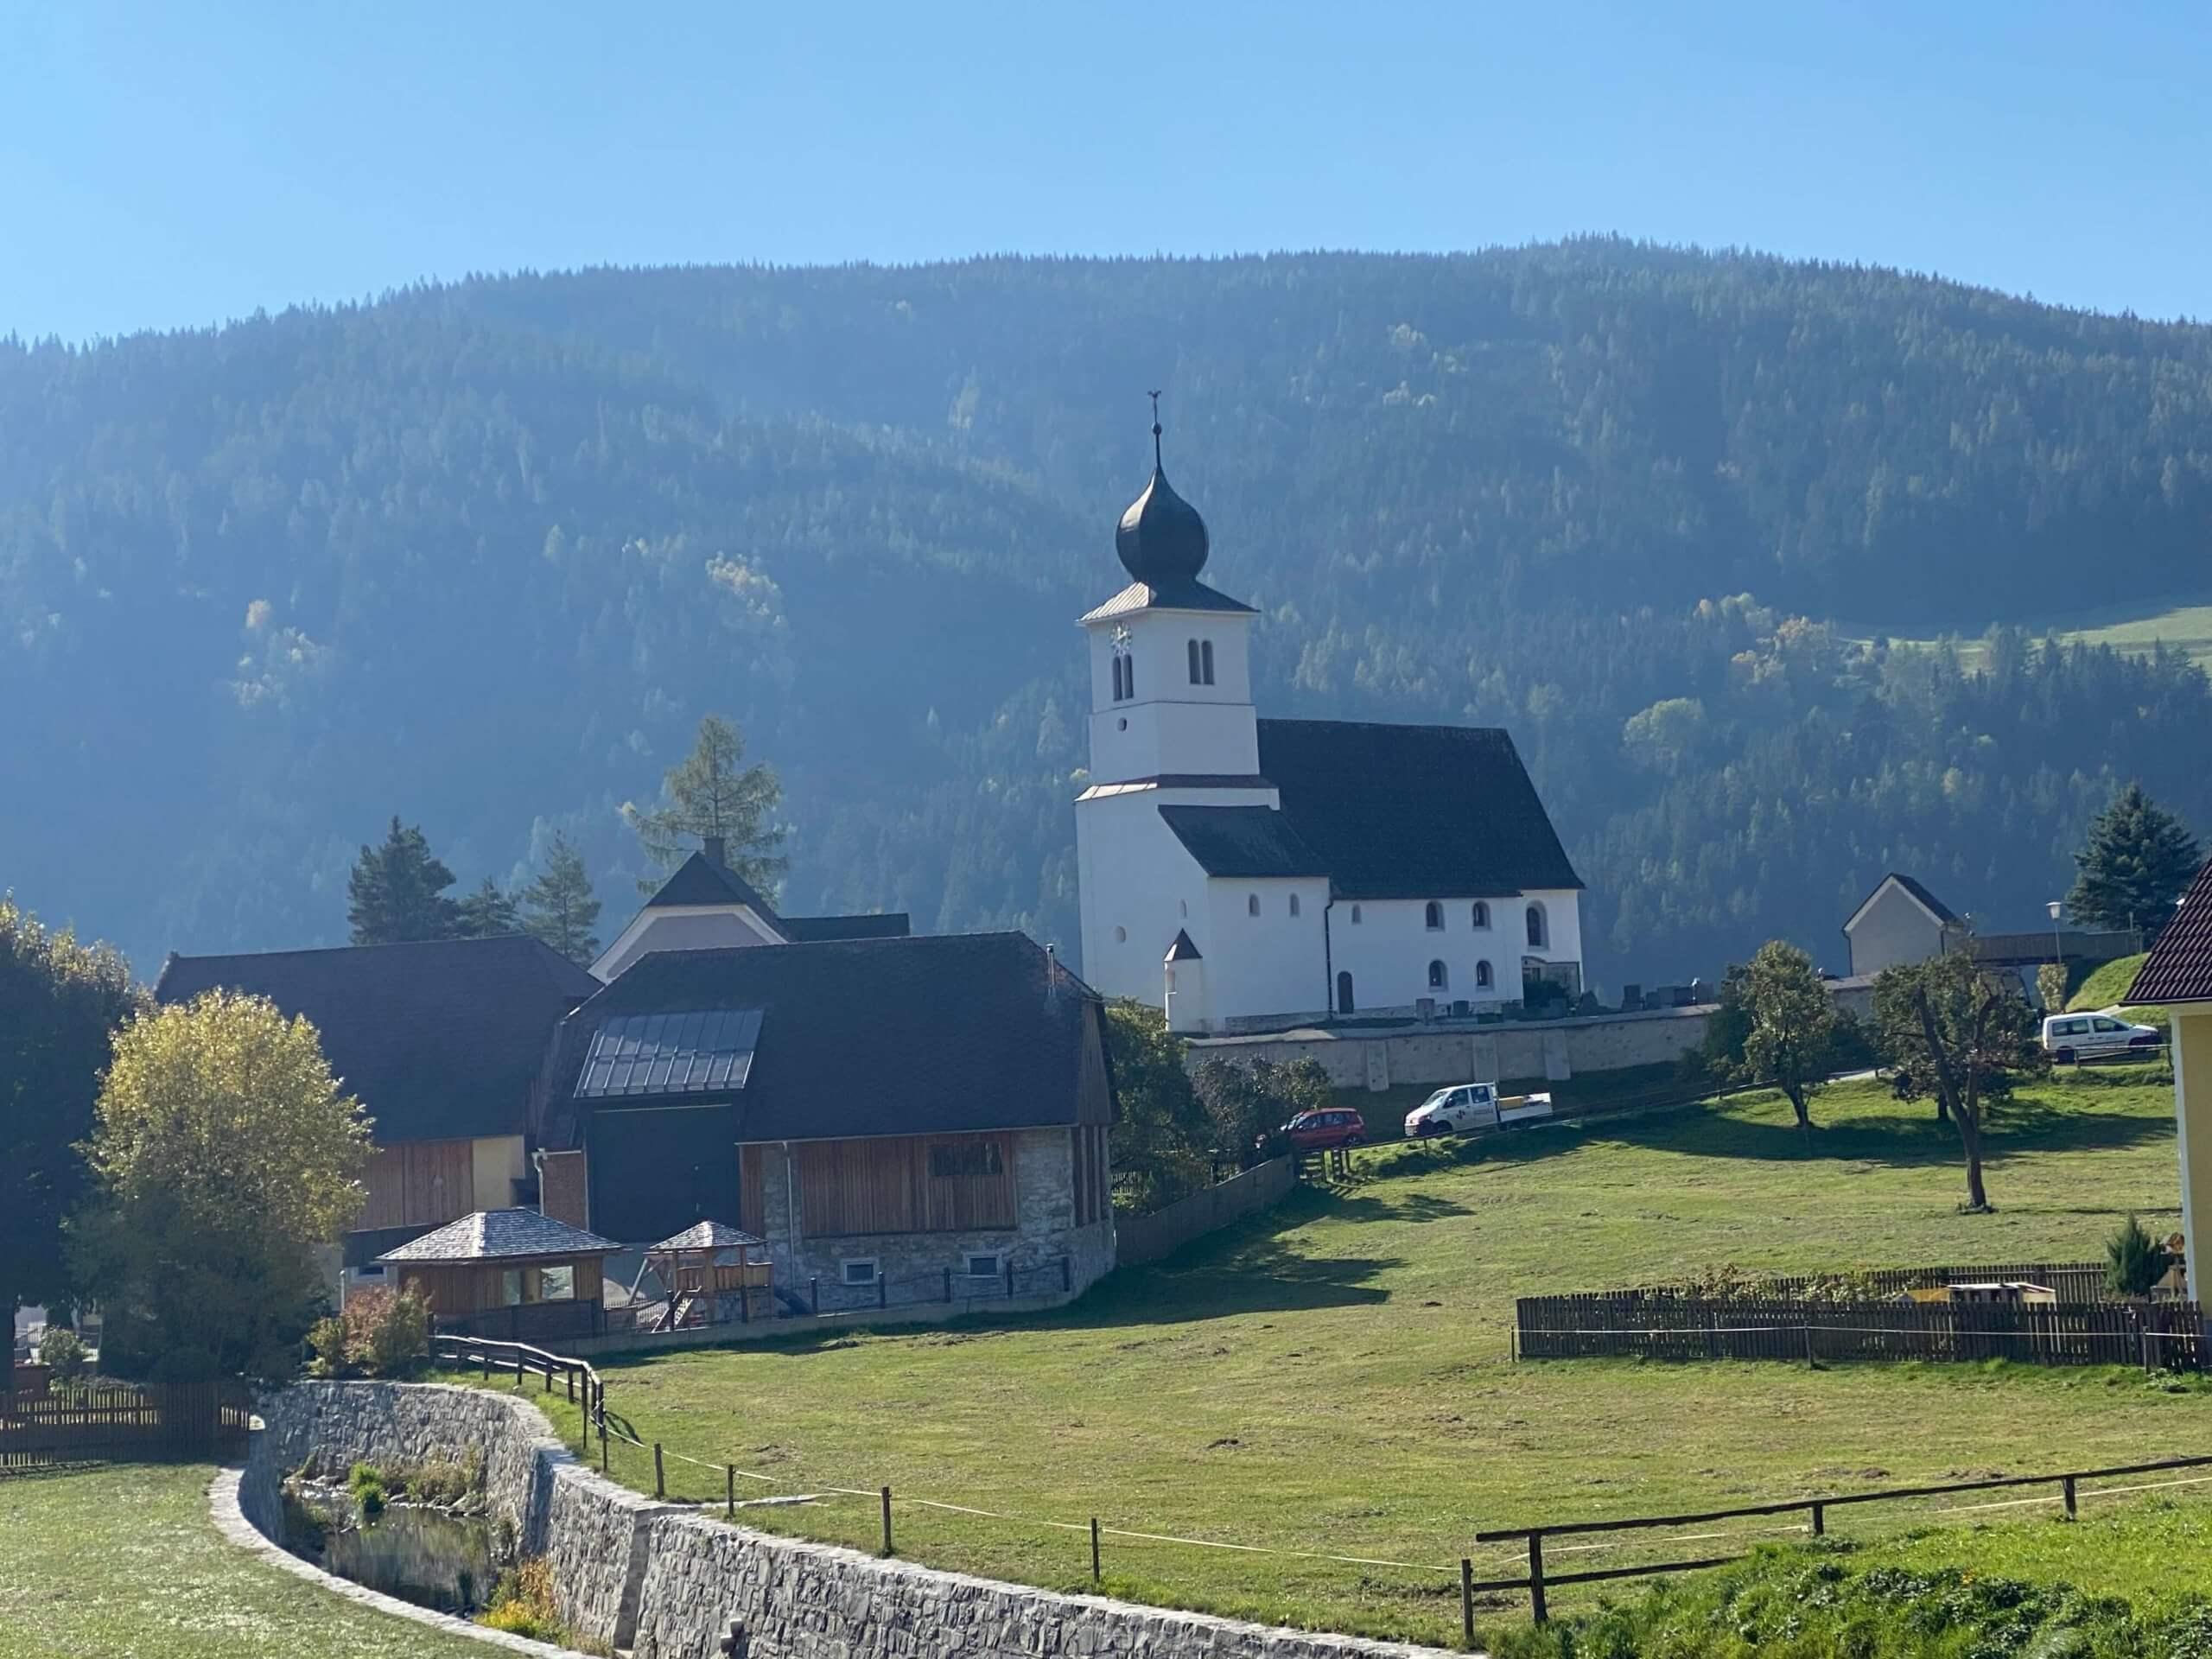 CIDCOM war in der Steiermark